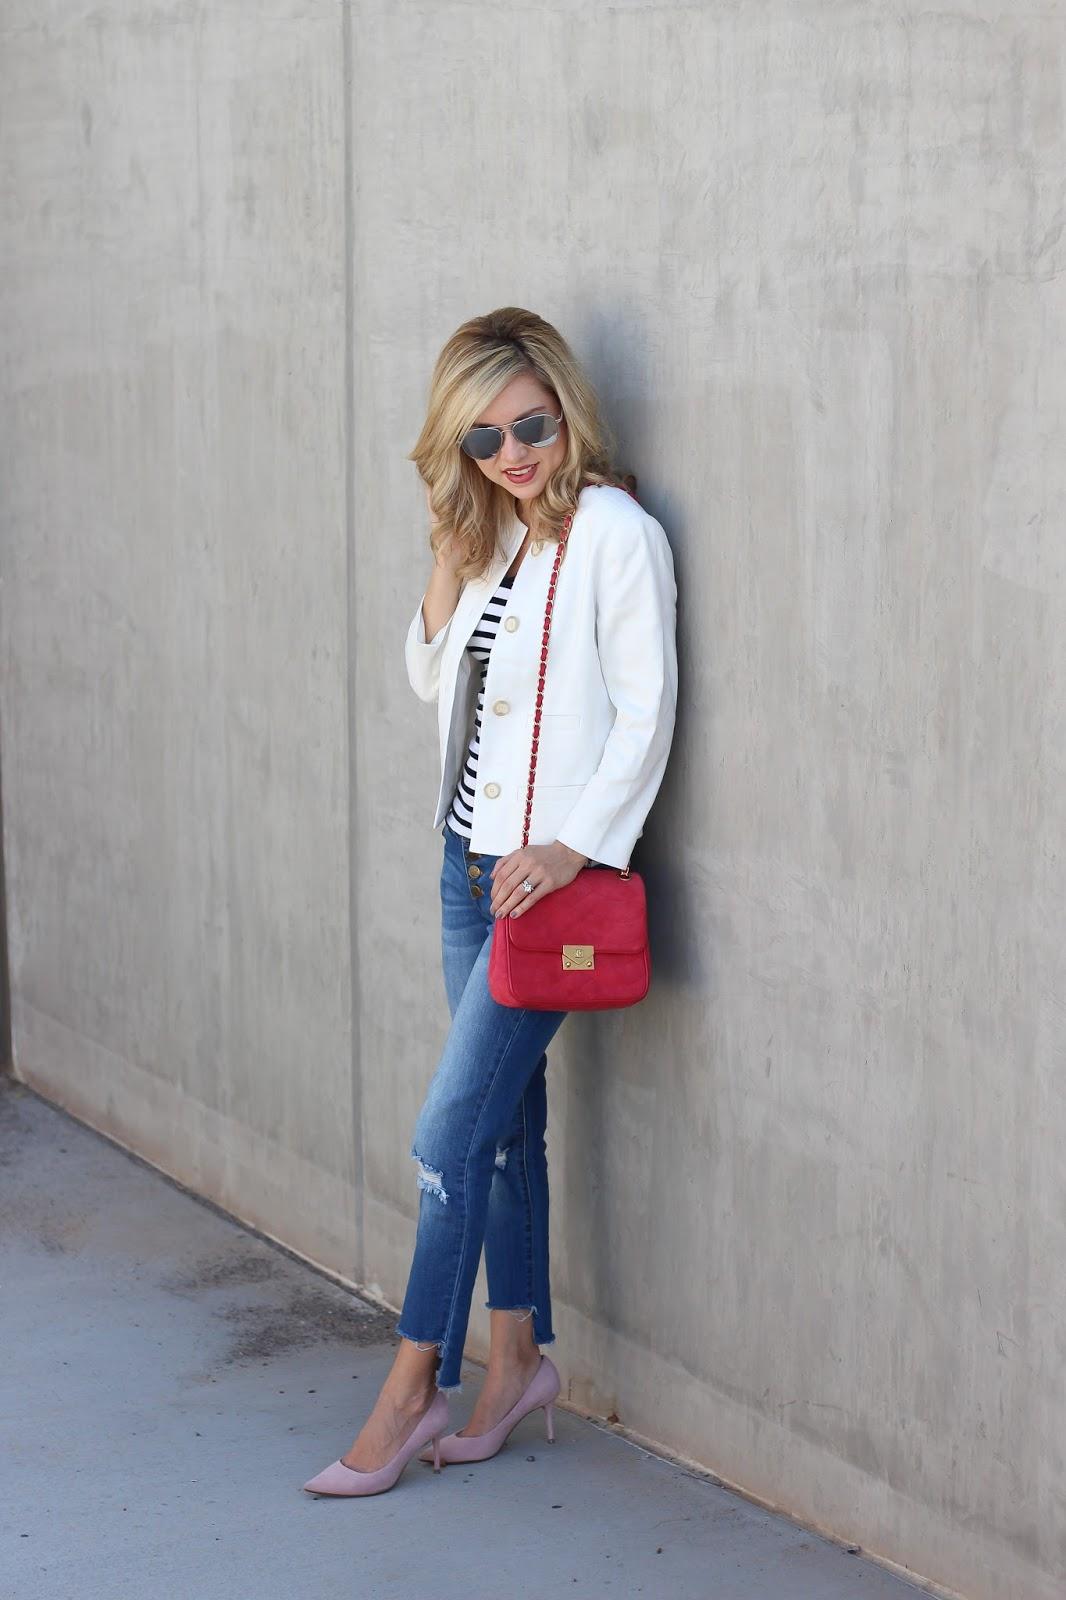 women fashion - blazer and jeans - pink